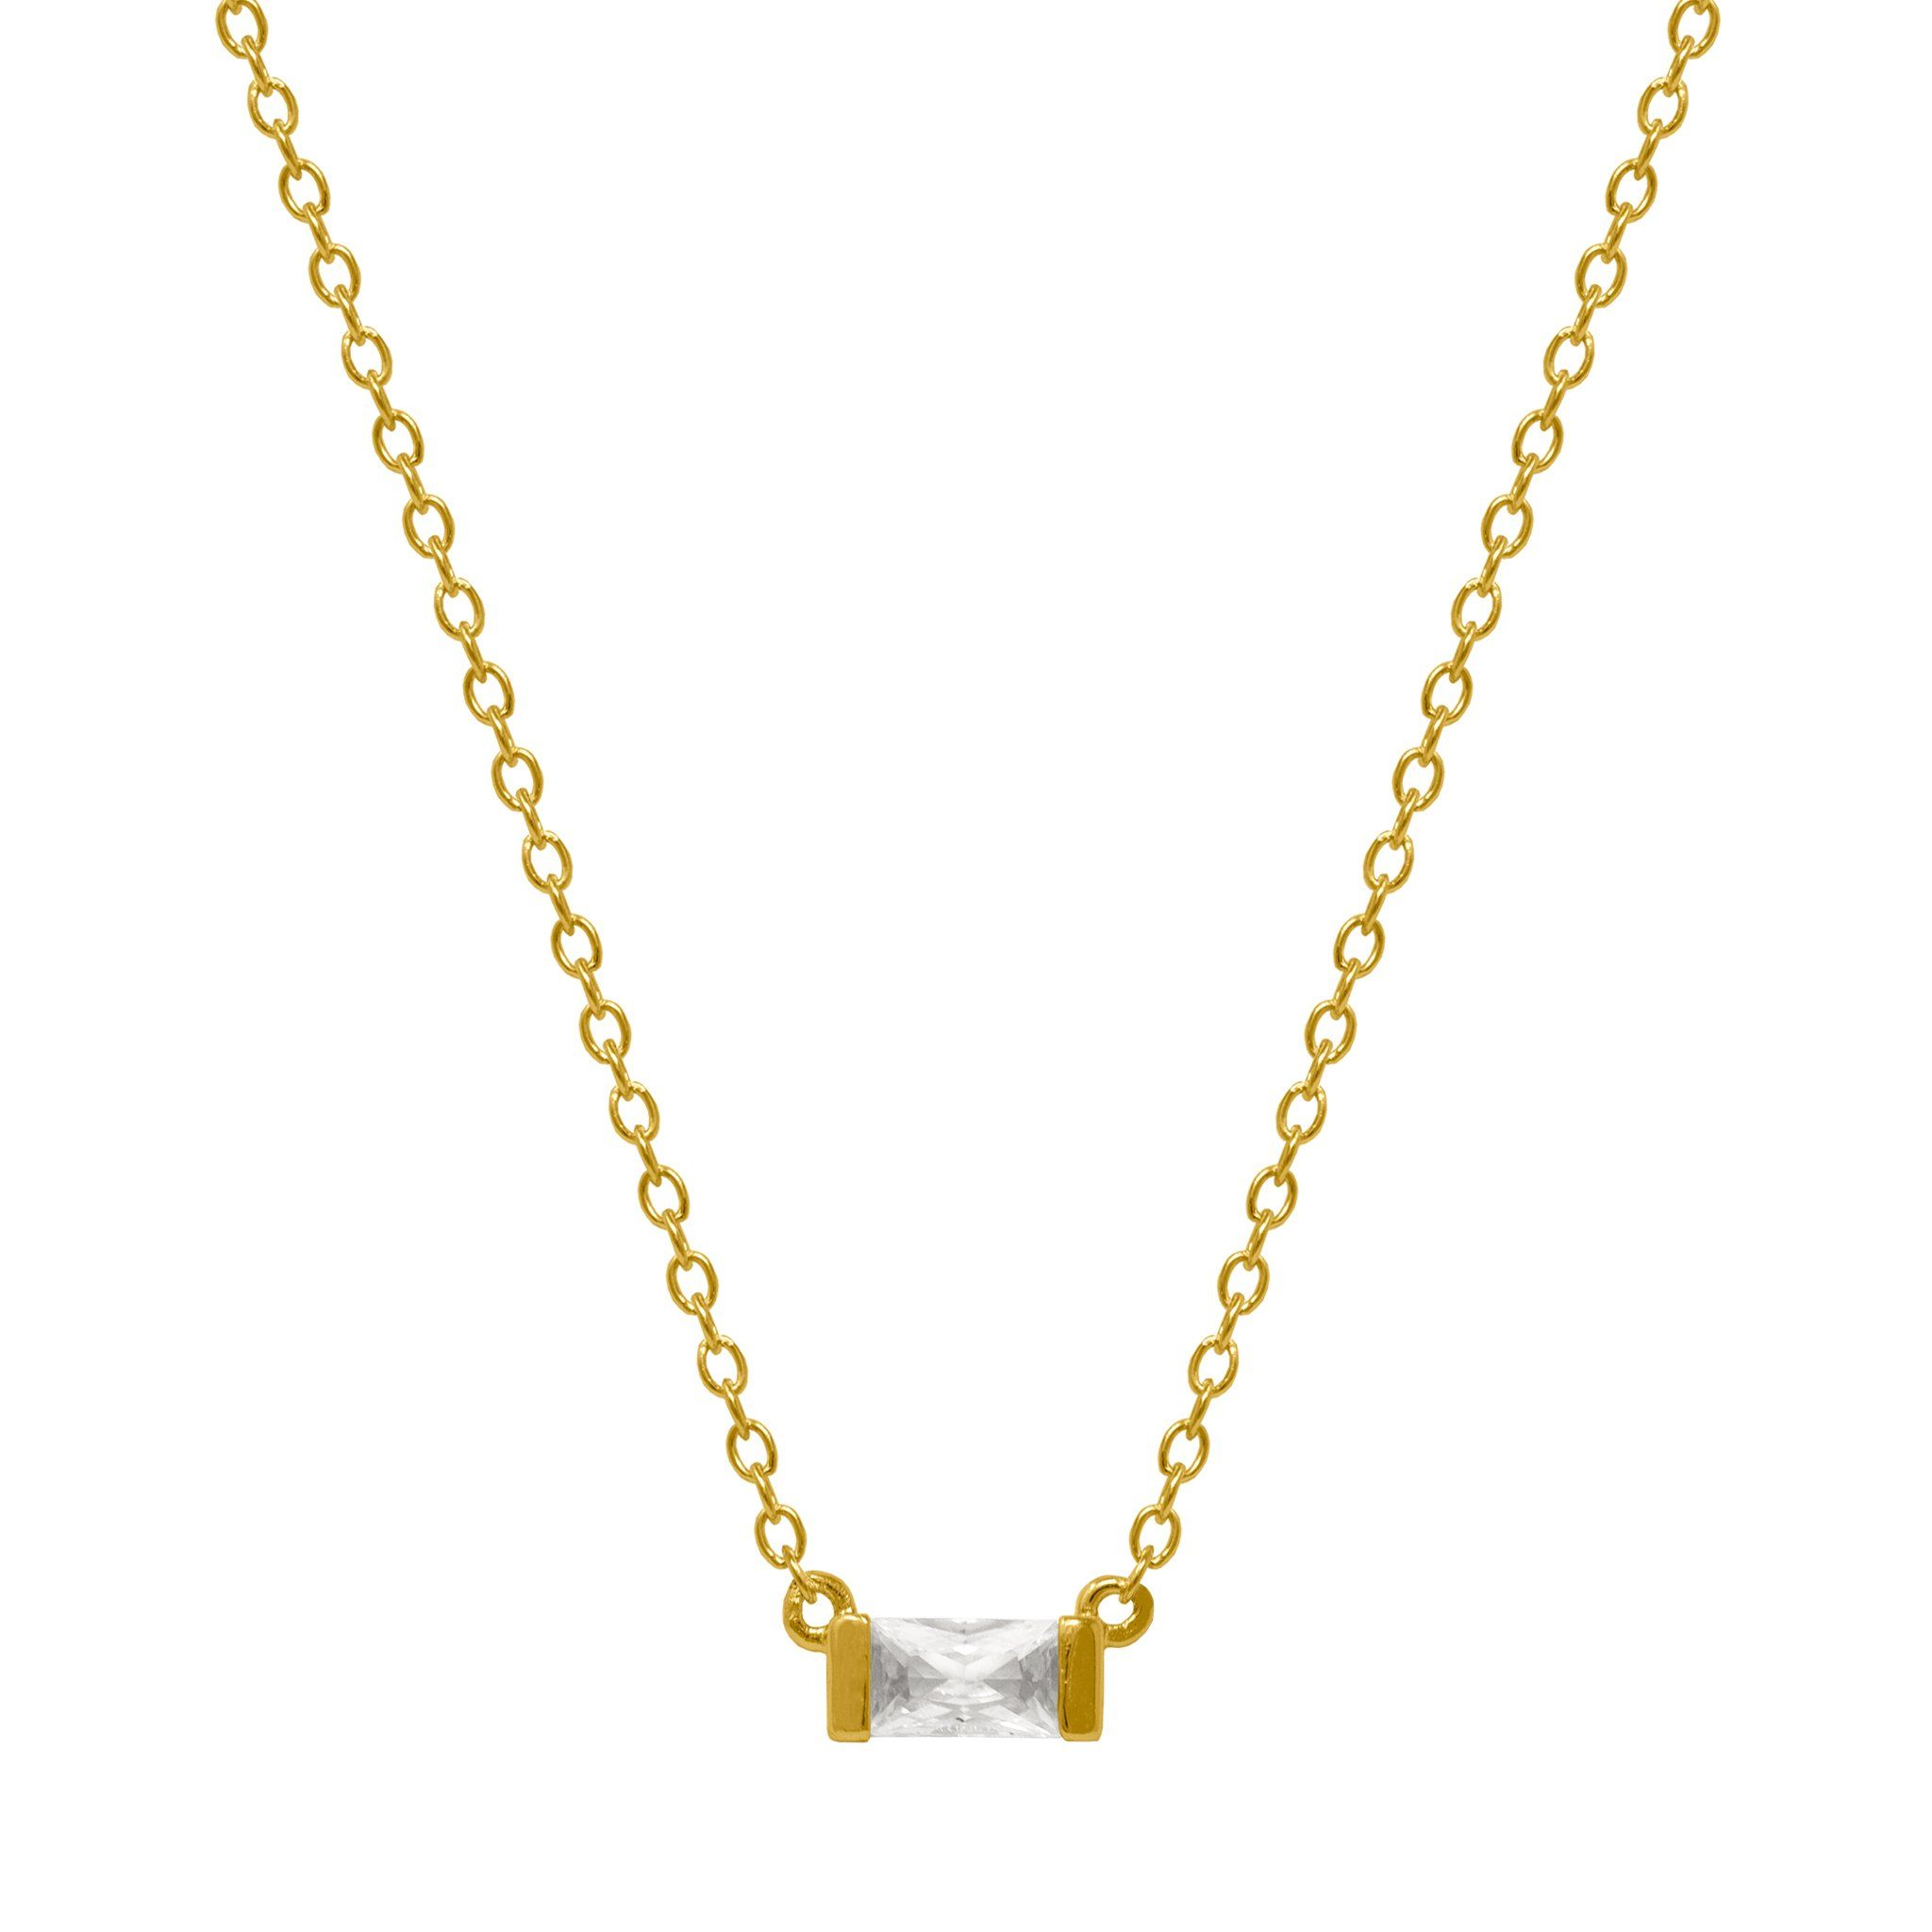 Photo of Joanna dainty pendant necklace